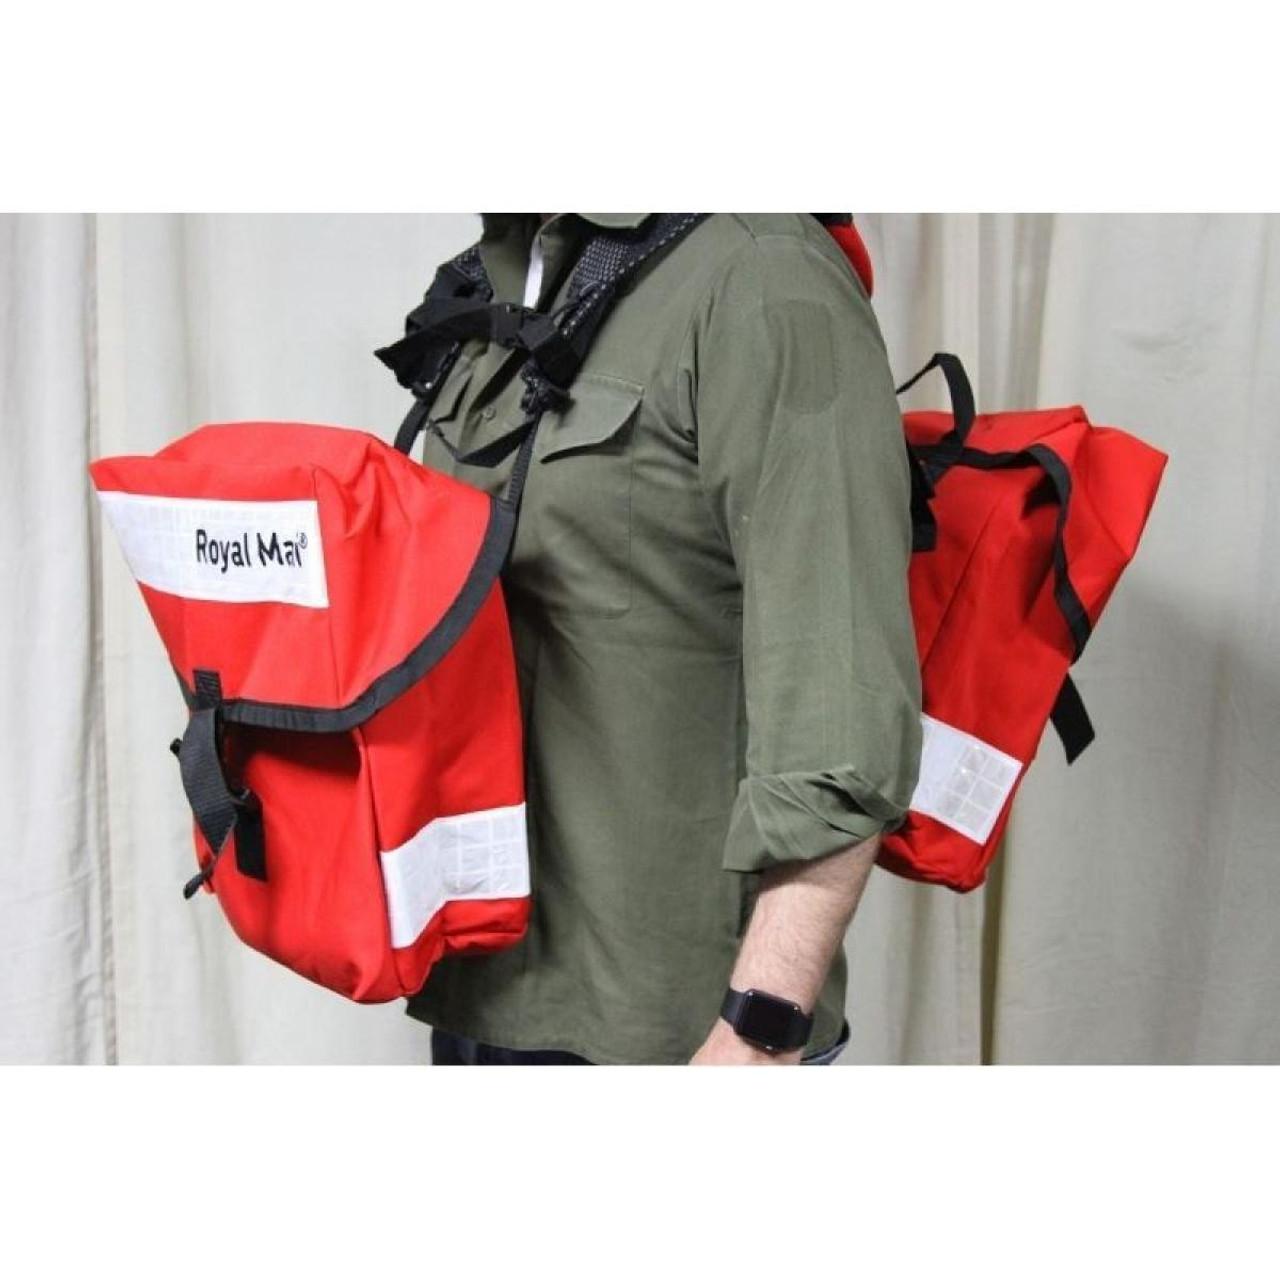 British Royal Mail Messenger Bag - Set - Hero Outdoors 0da951f4495a1